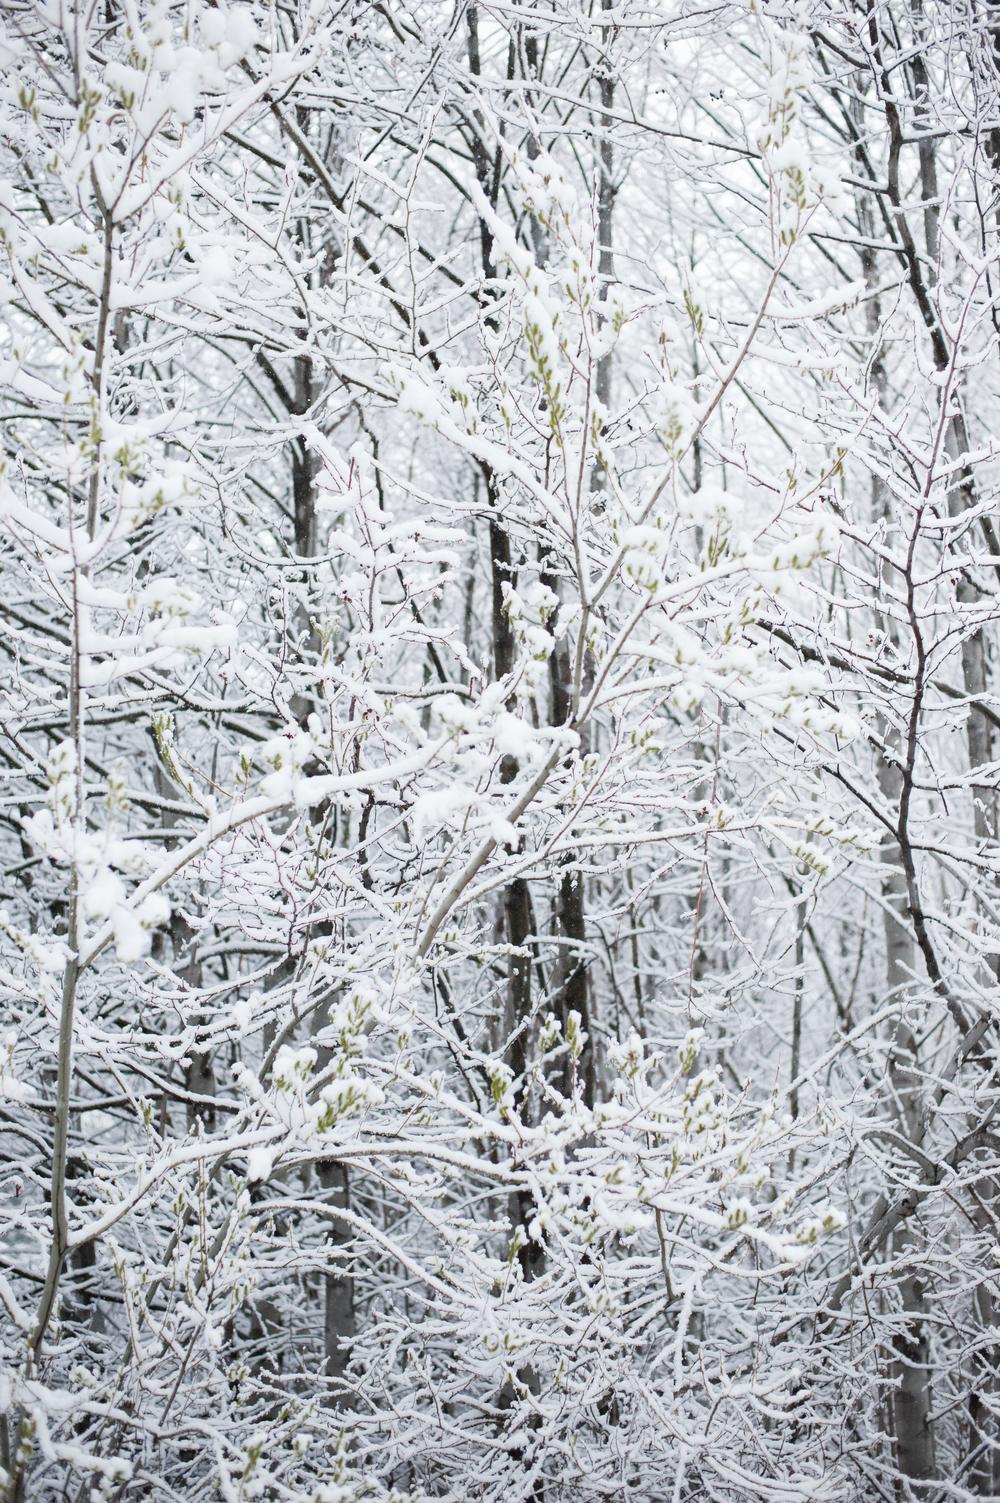 March 2 Snow-1.jpg